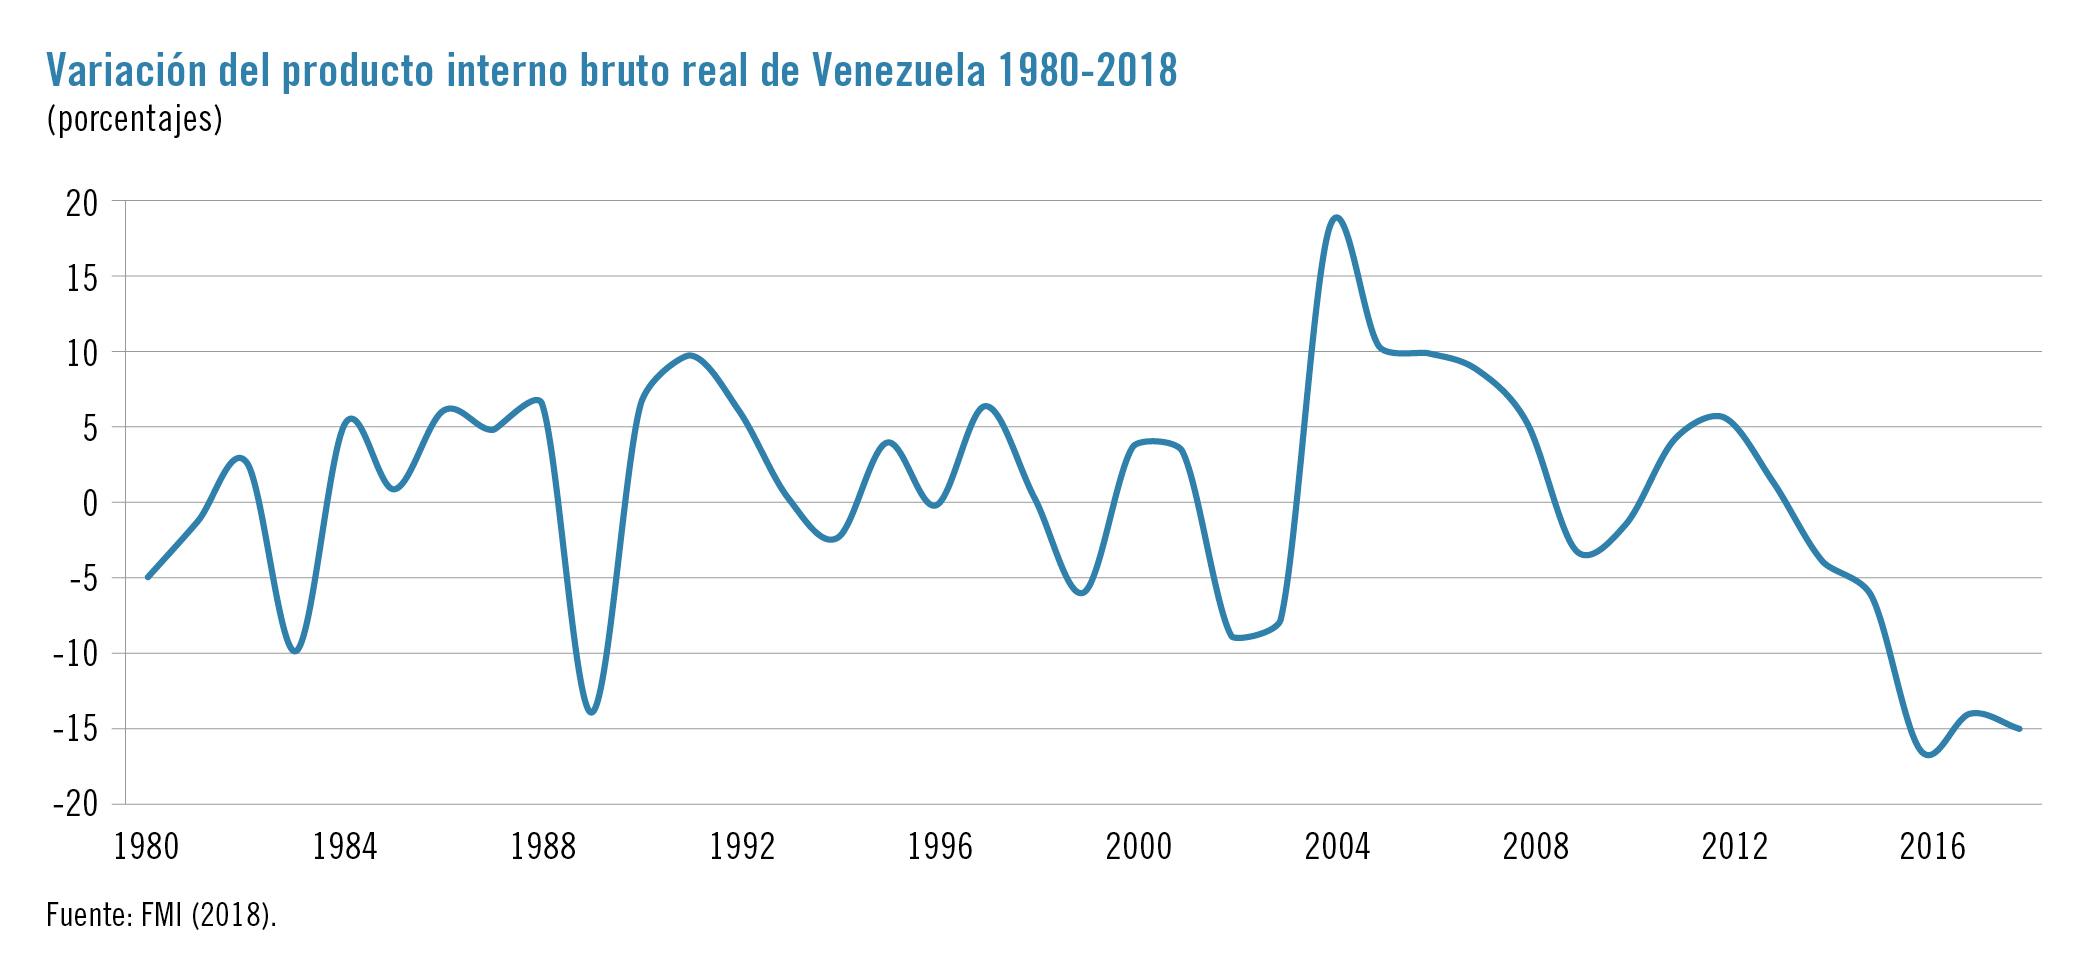 Colapso De La Industria Petrolera Y La Crisis Venezolana